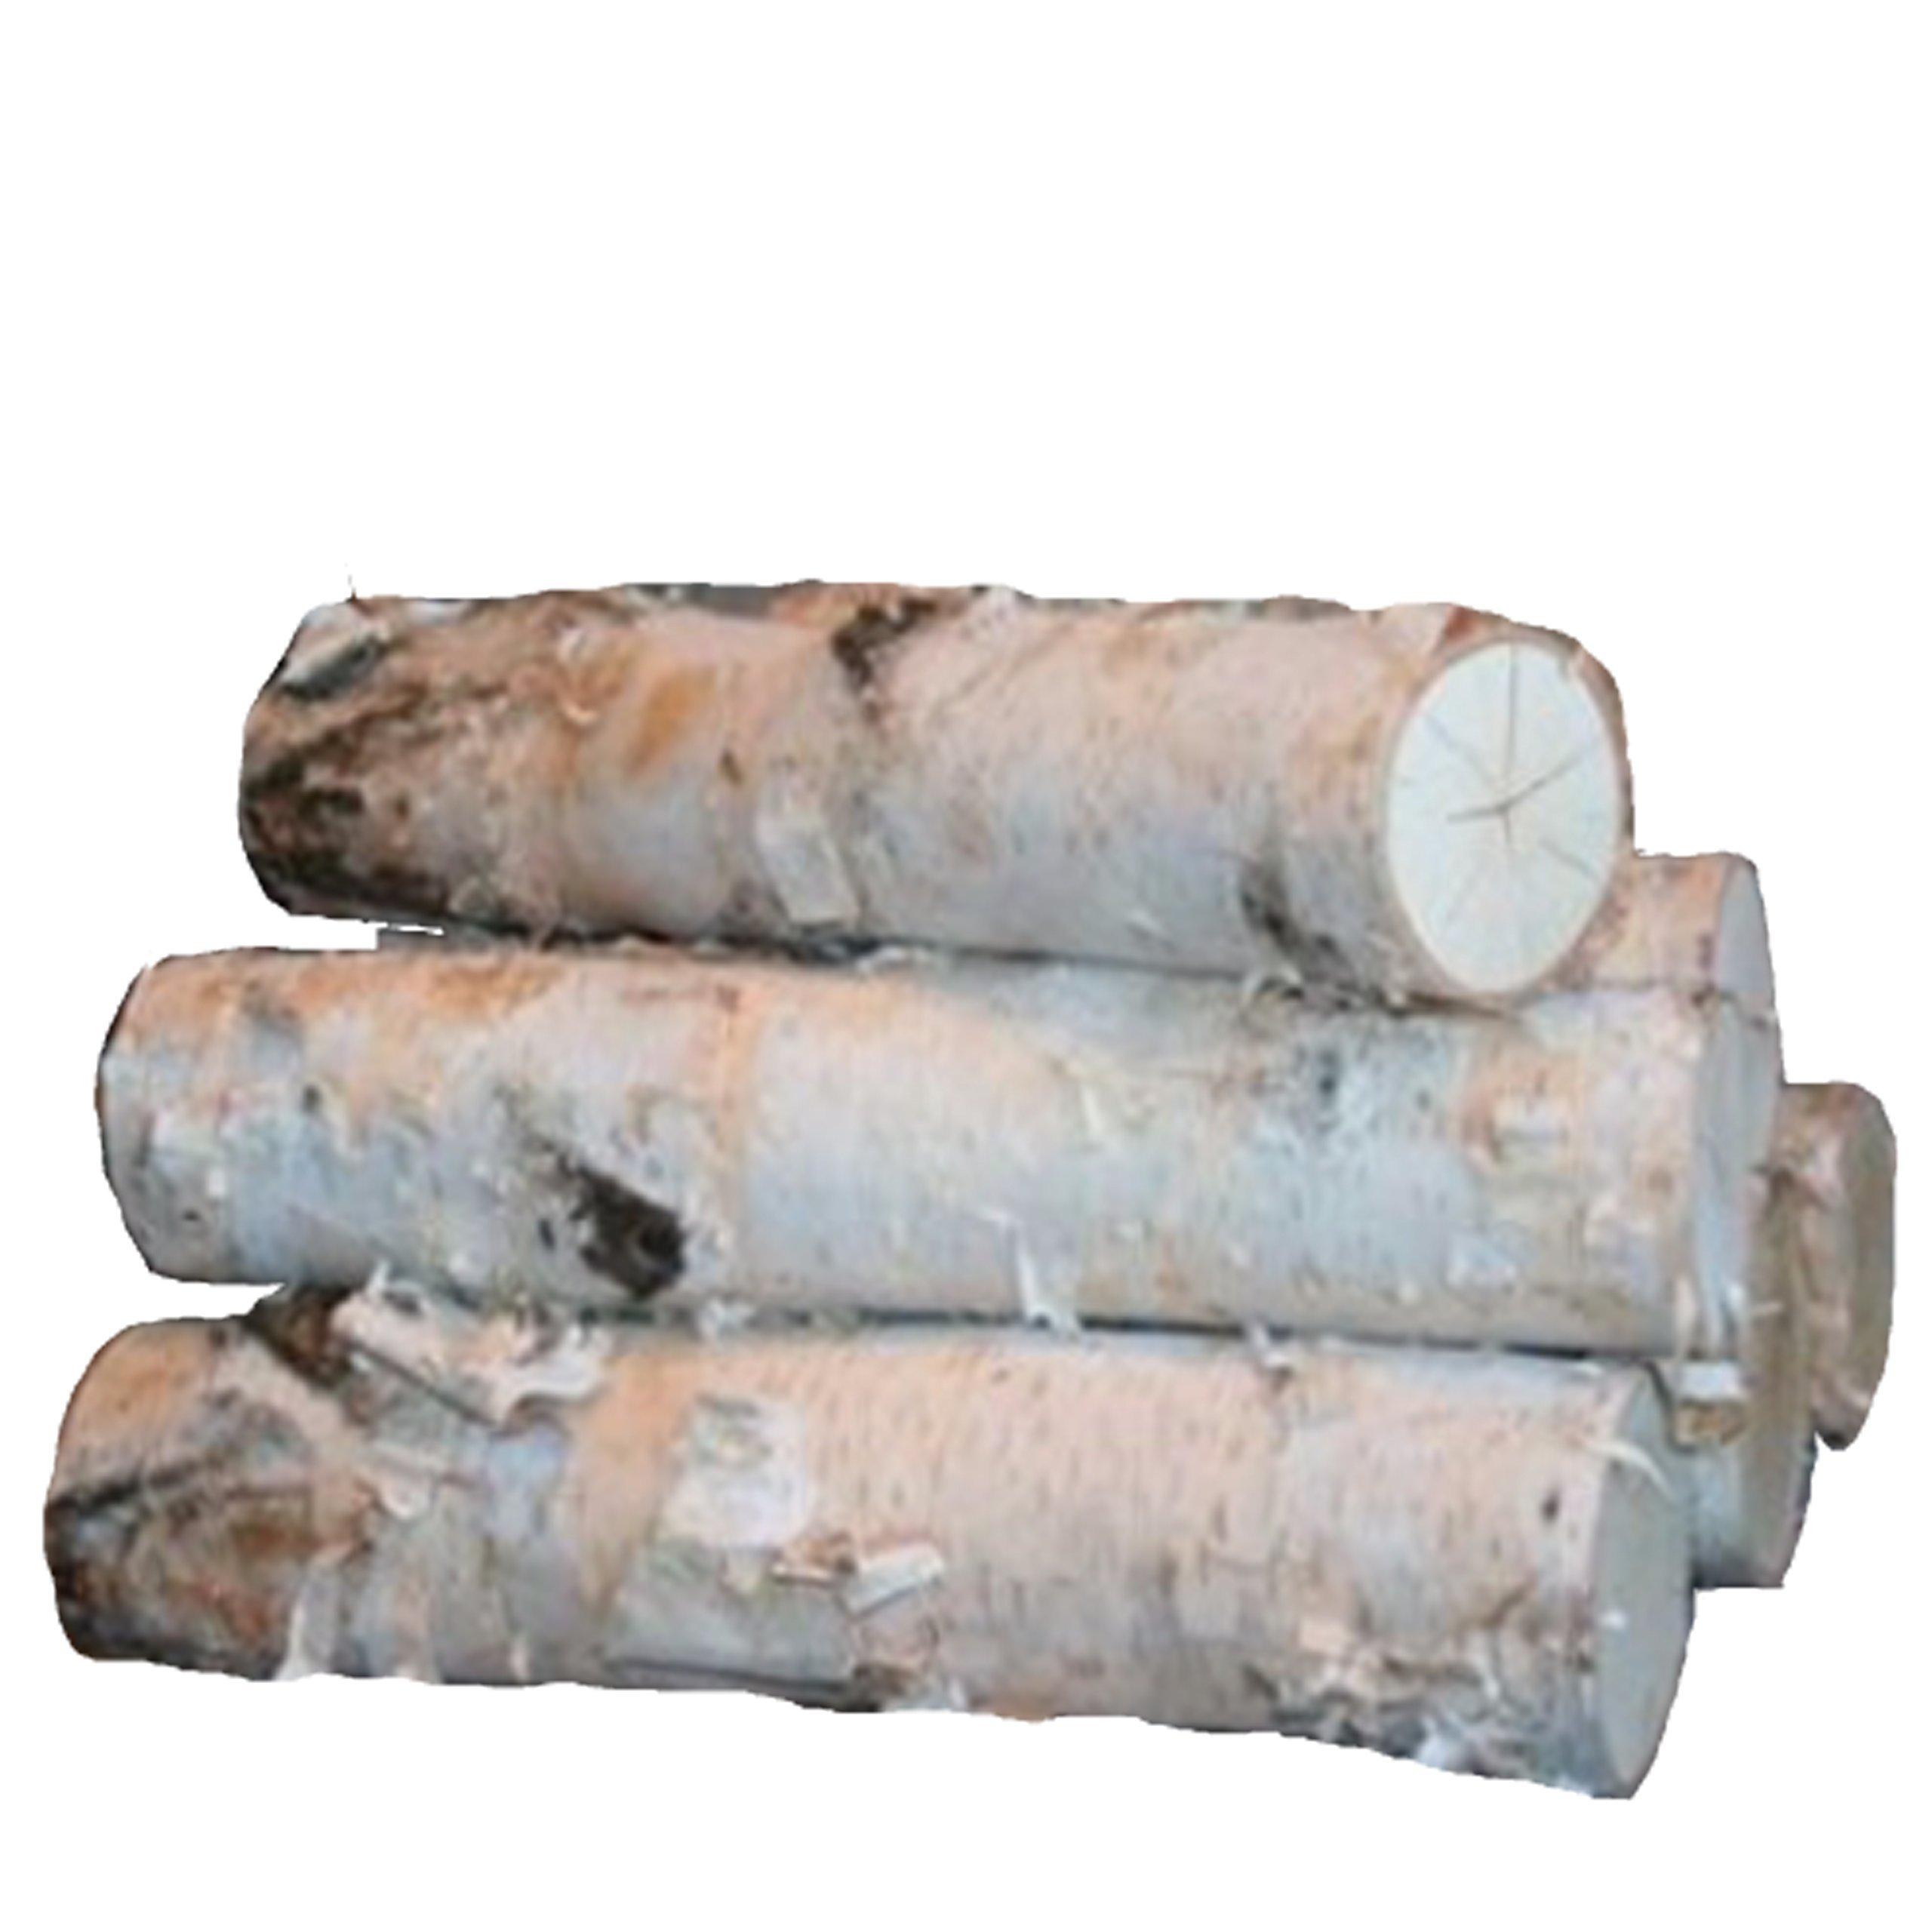 Large Birch Fireplace Log Set (5 Logs: 3-5 inch Dia. x 17-18 inch Long) by Wilson Enterprises